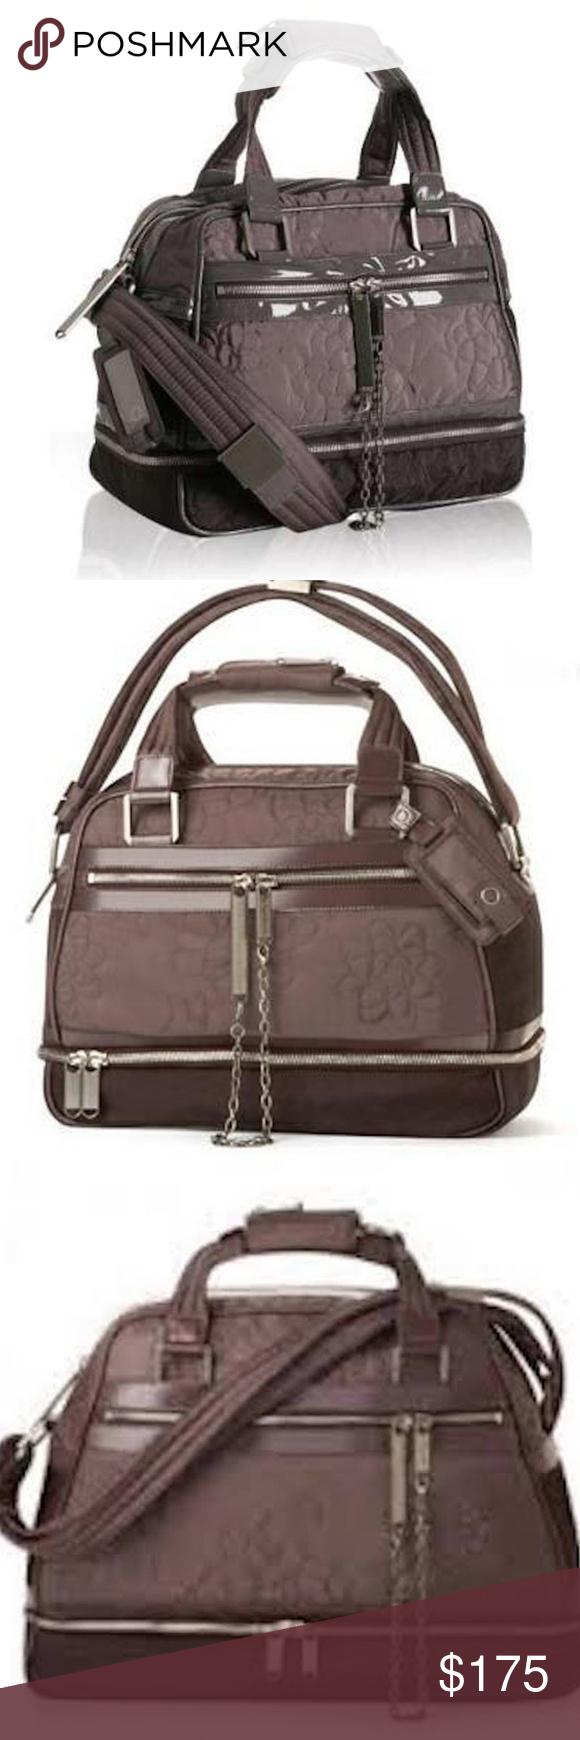 9382683857bf Stella McCartney LeSportsac Travel Bag The Stella McCartney for LeSportsac  Limited Edition collection Large Bowling Bag